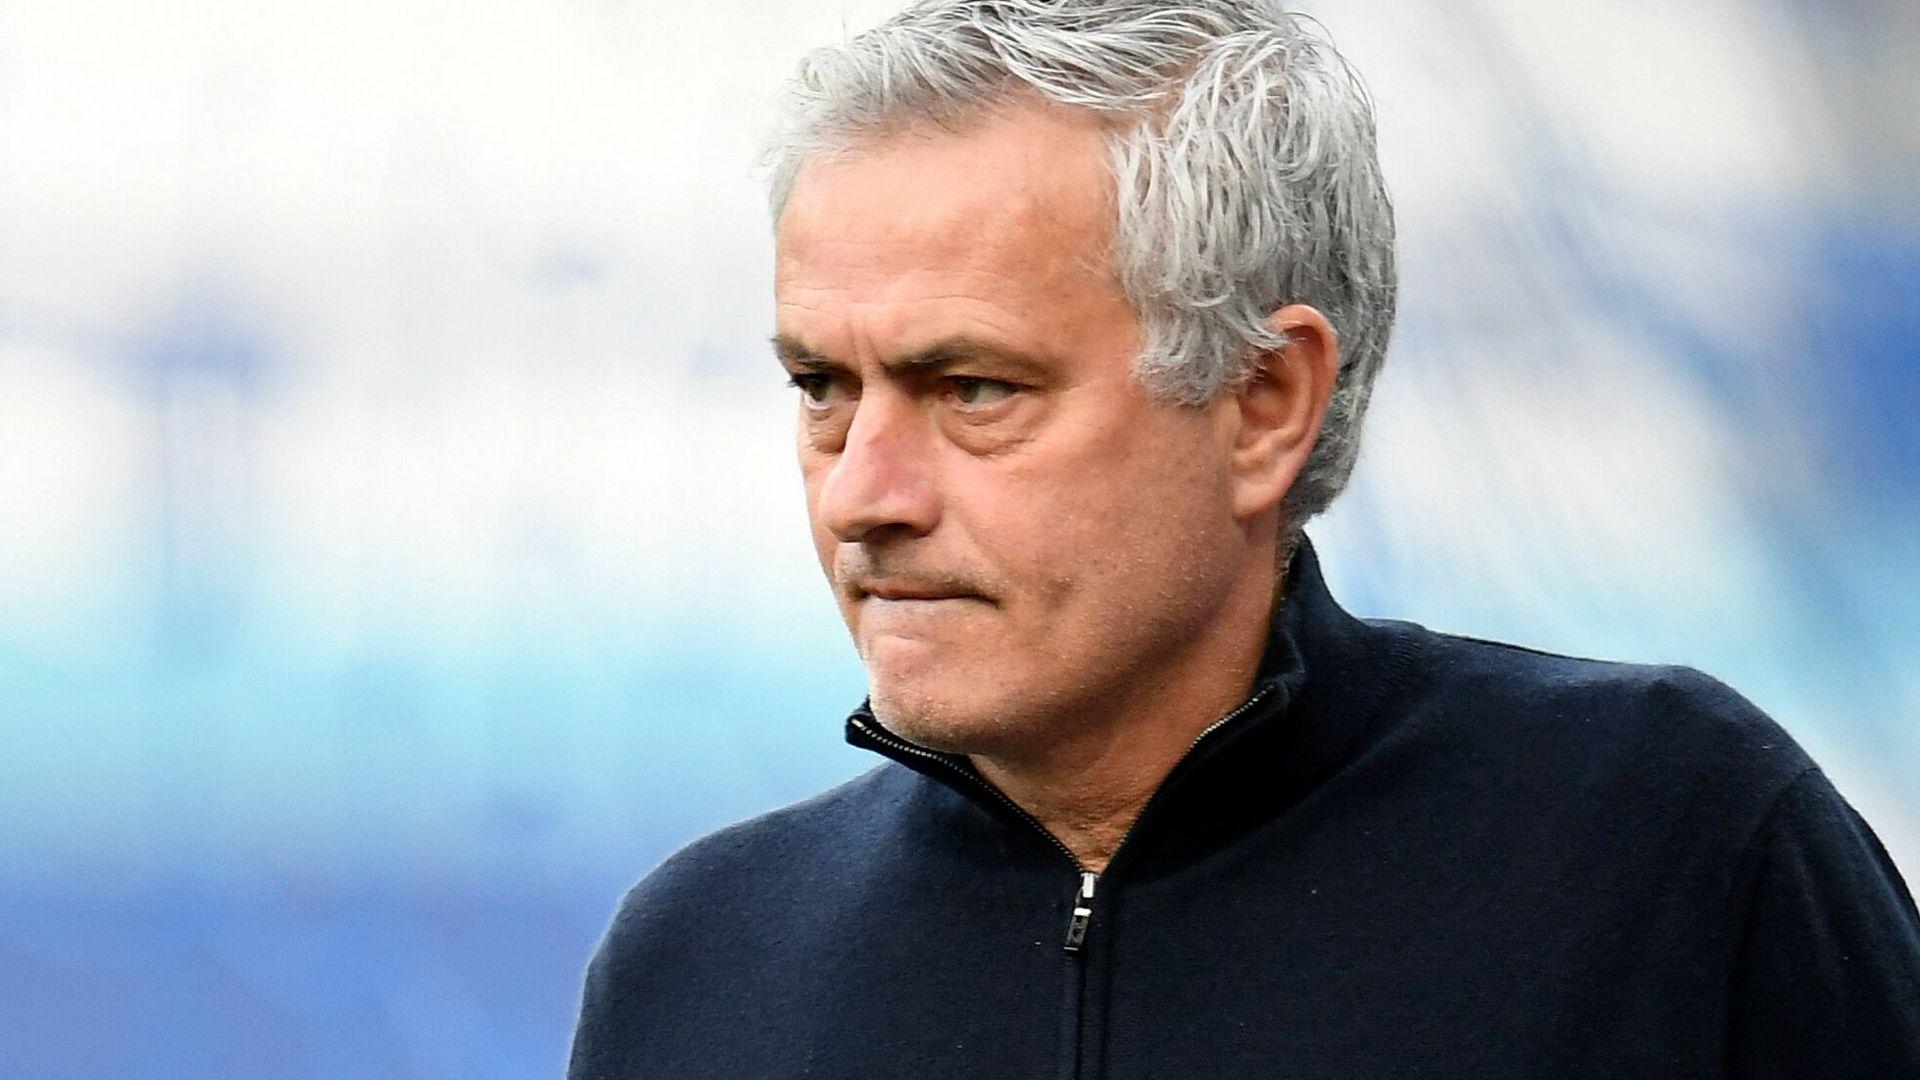 Jose Mourinho appointed Roma head coach for next season